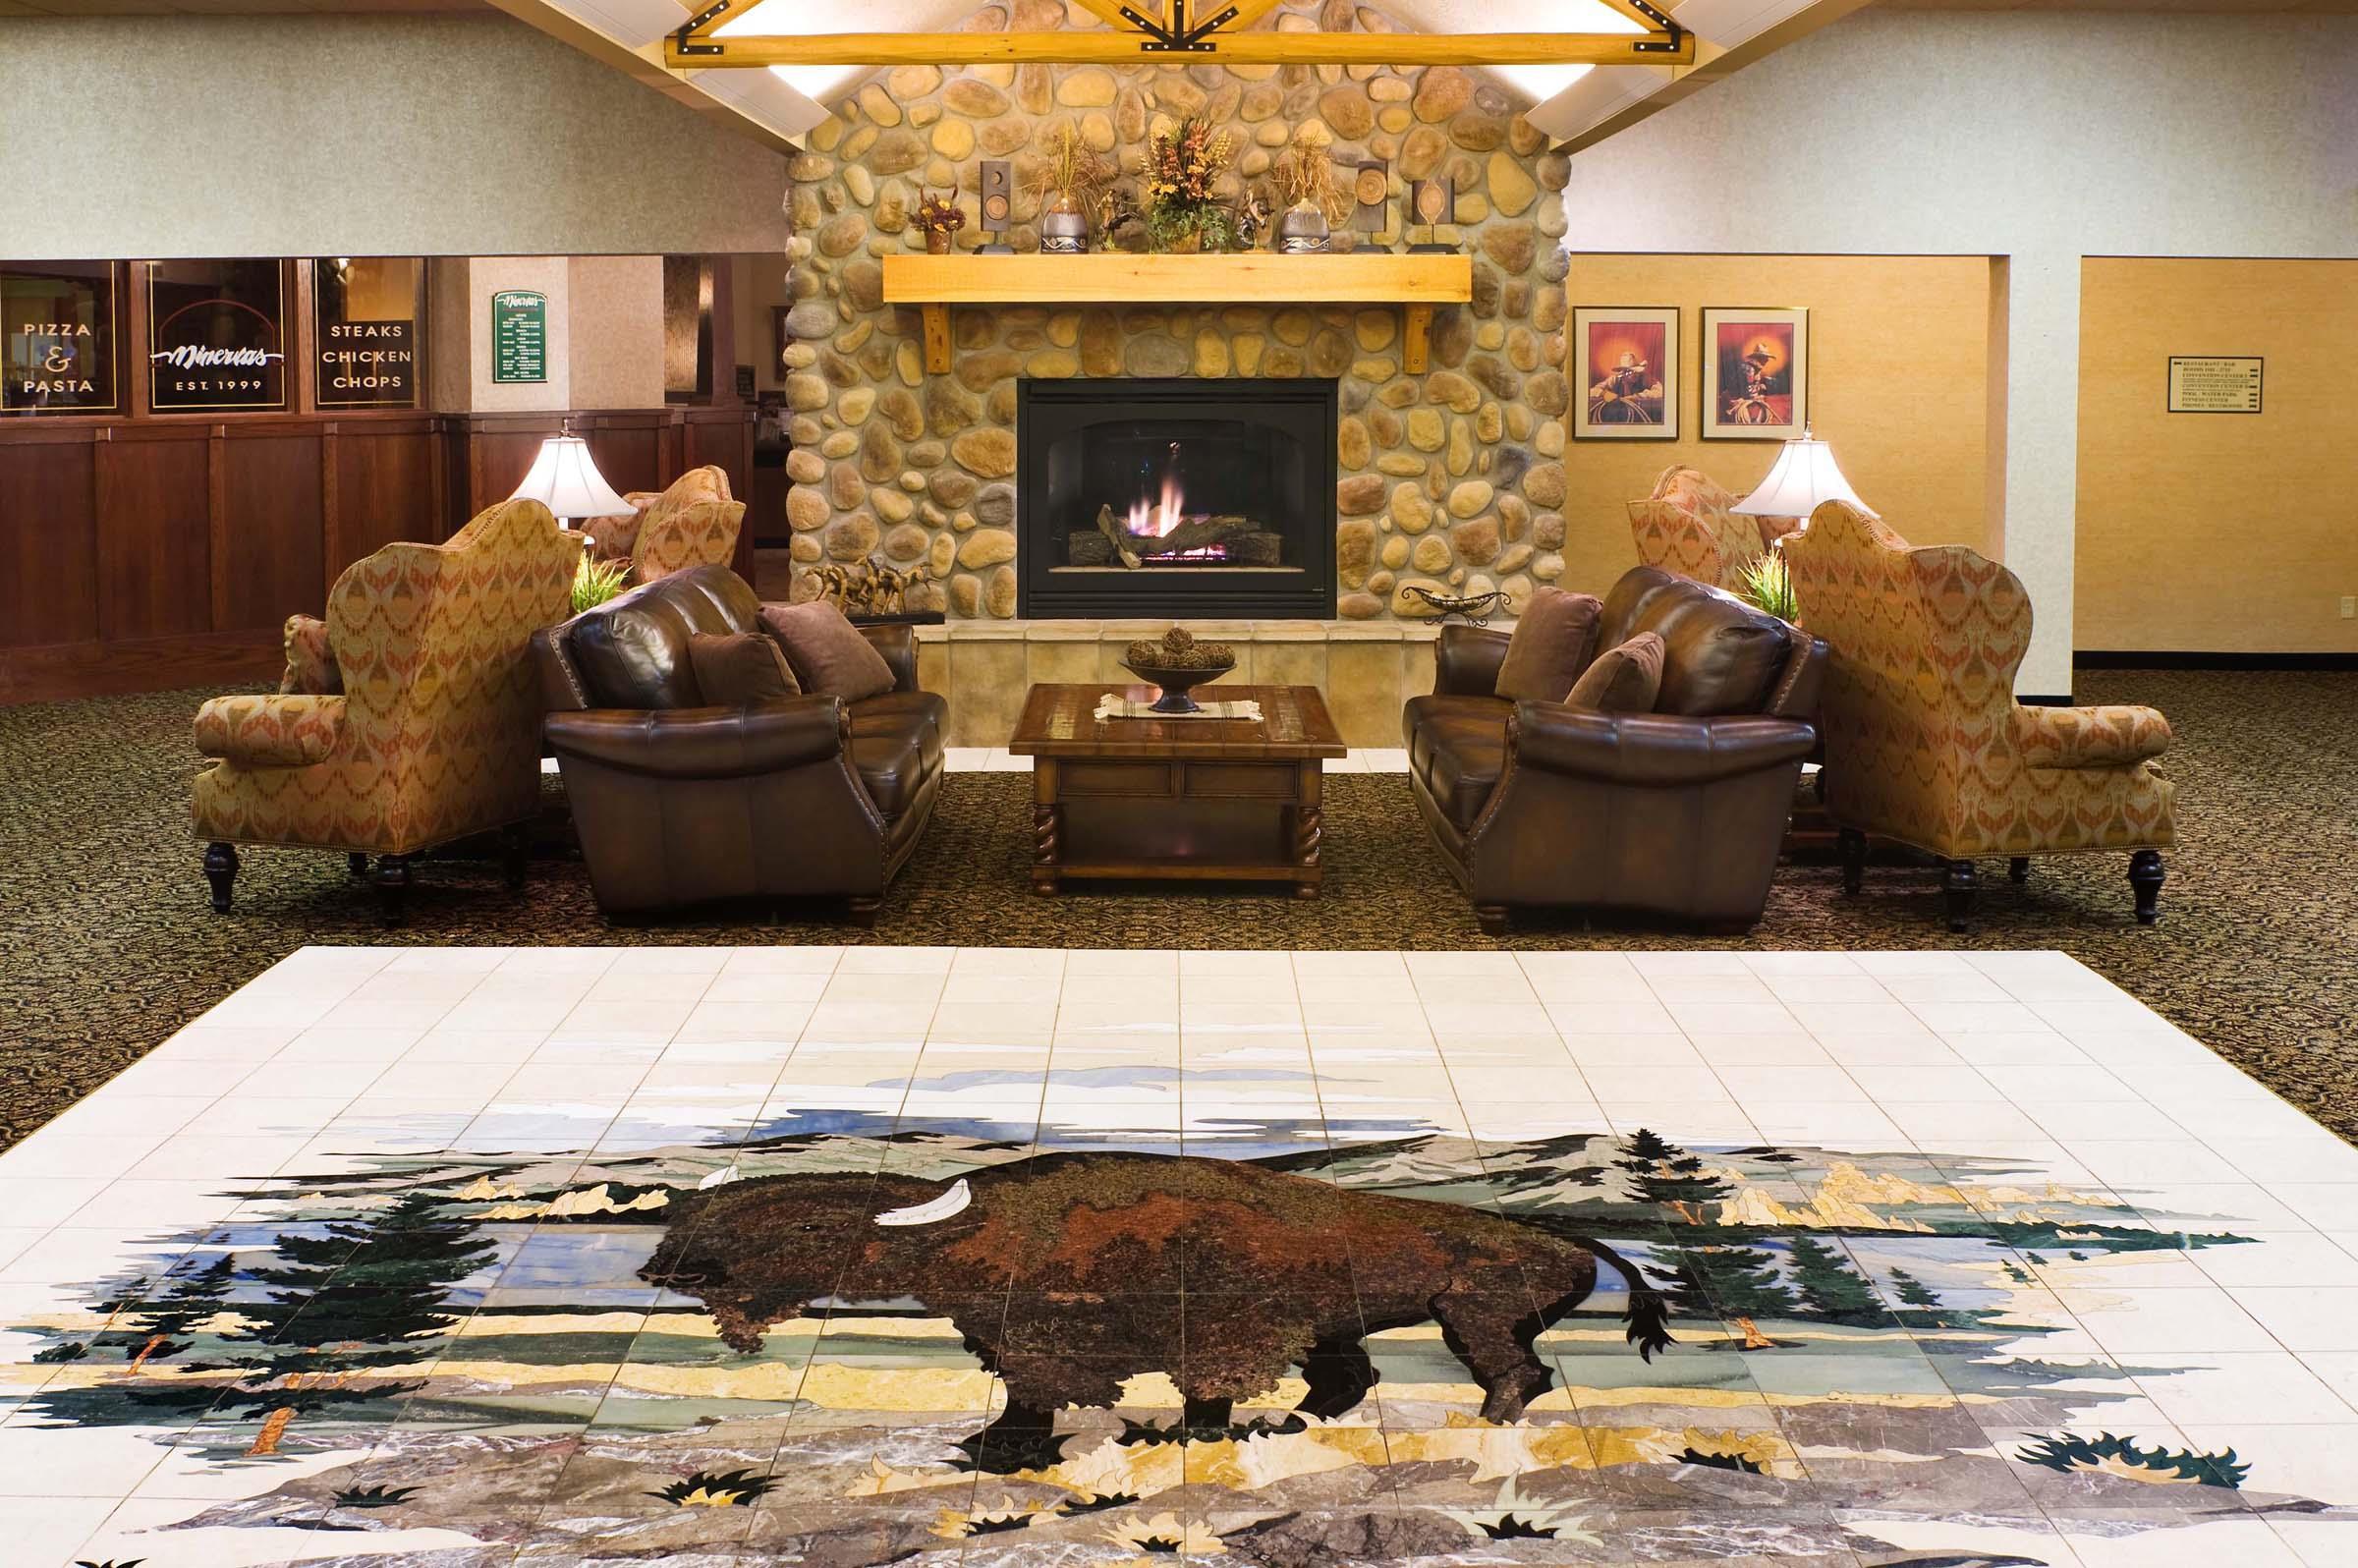 Best Western Ramkota Hotel image 23